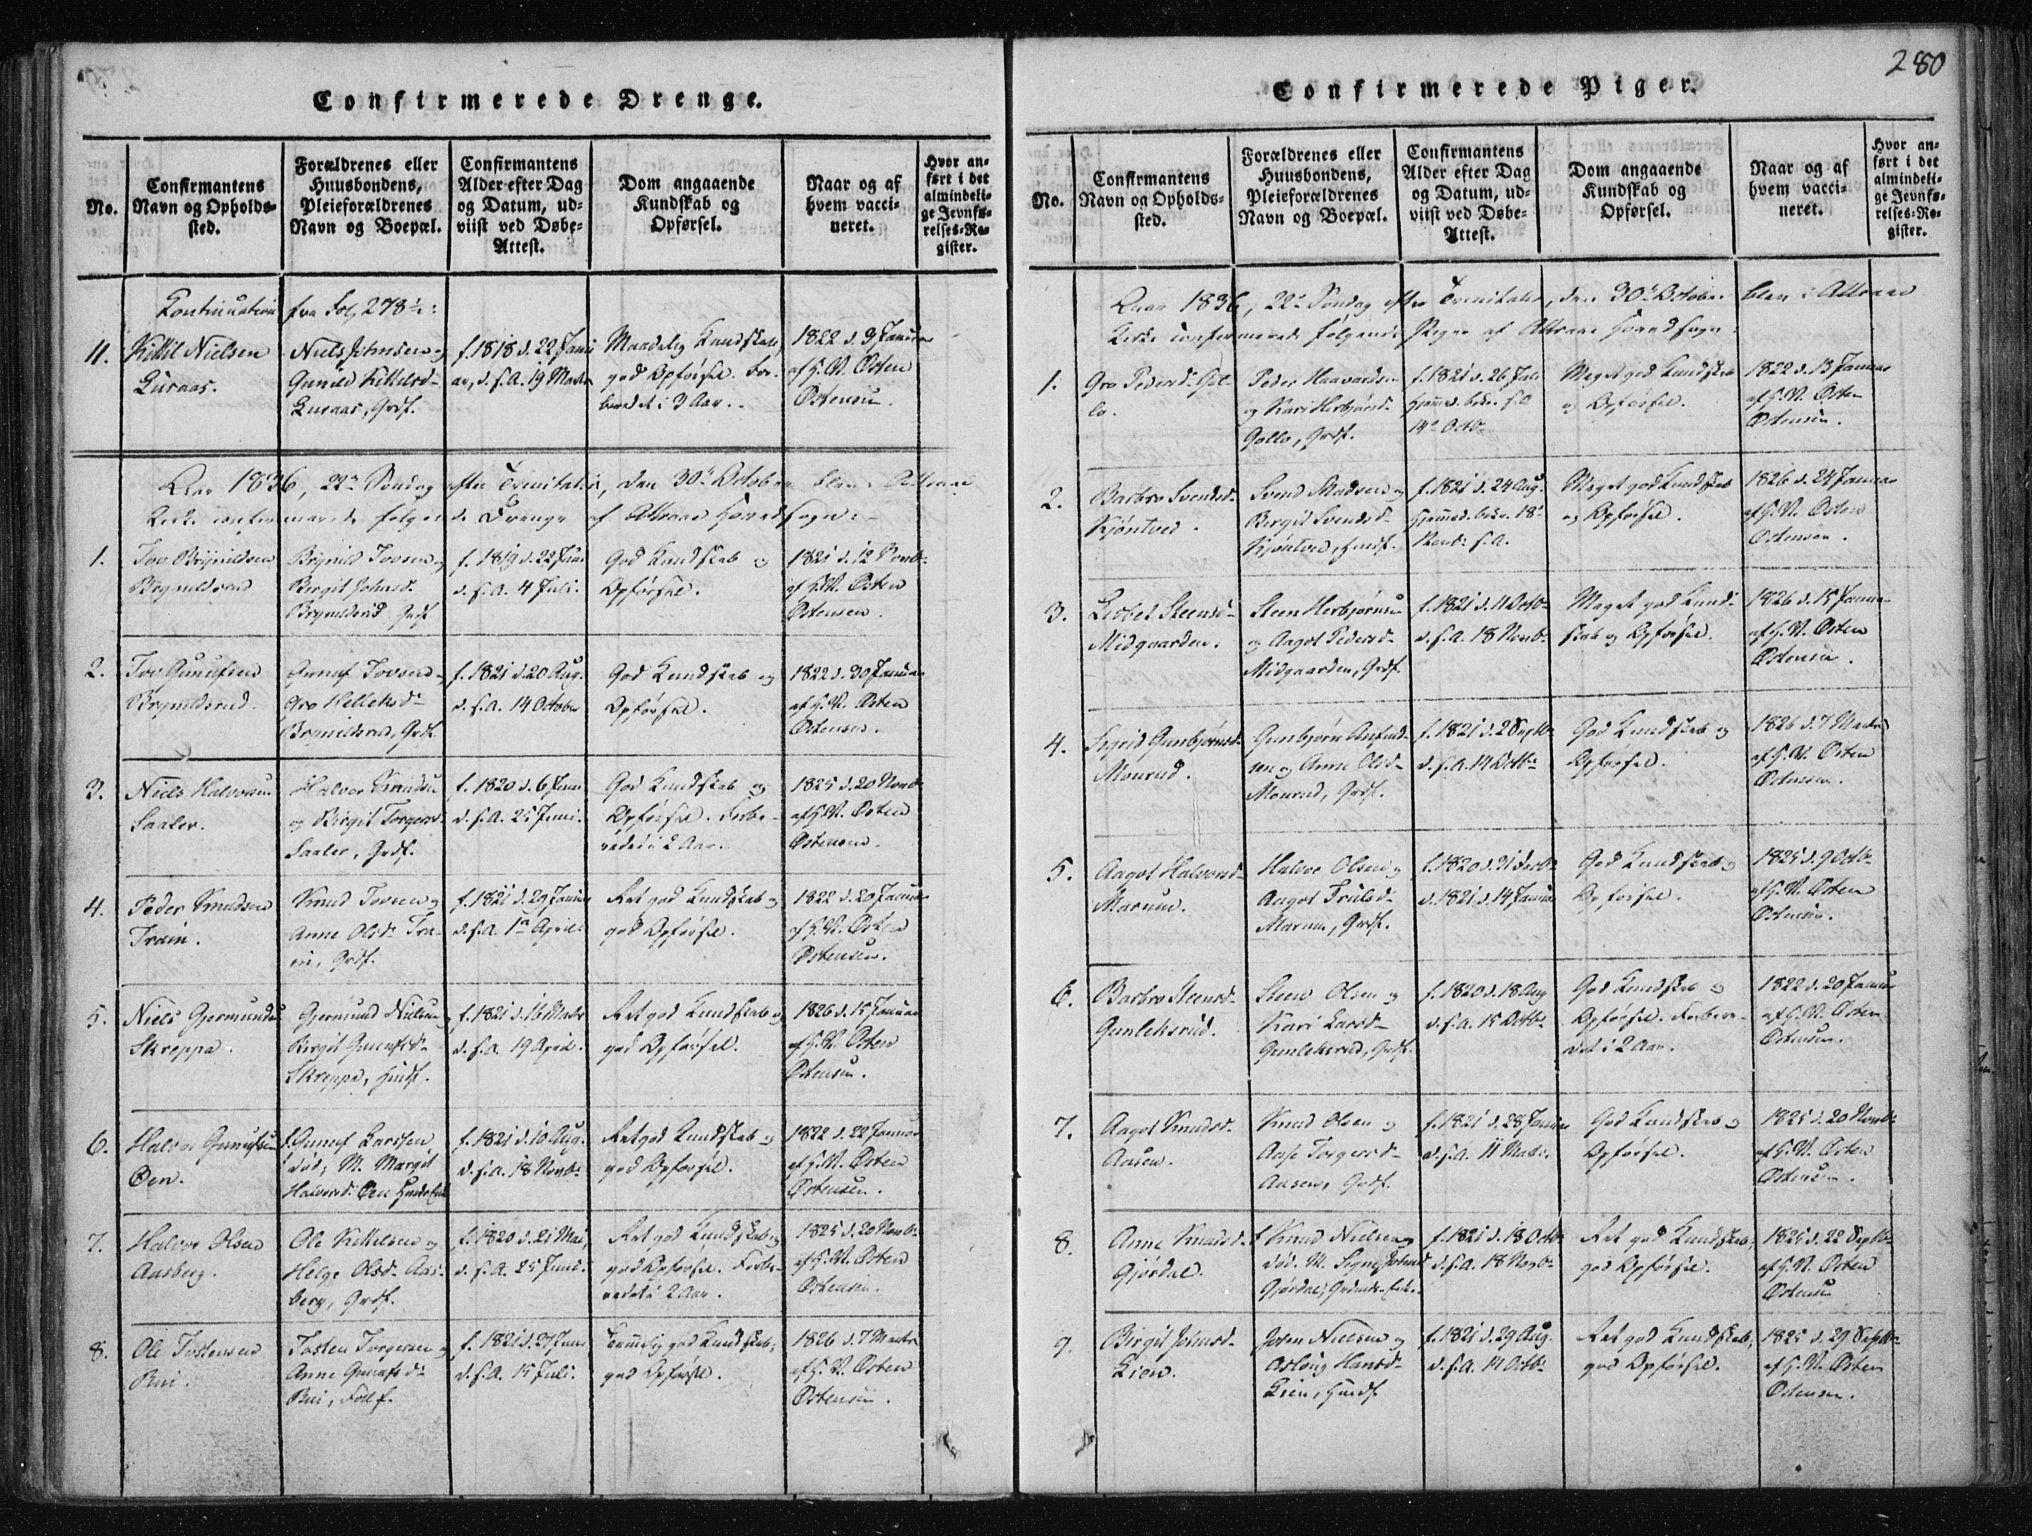 SAKO, Tinn kirkebøker, F/Fa/L0004: Ministerialbok nr. I 4, 1815-1843, s. 280